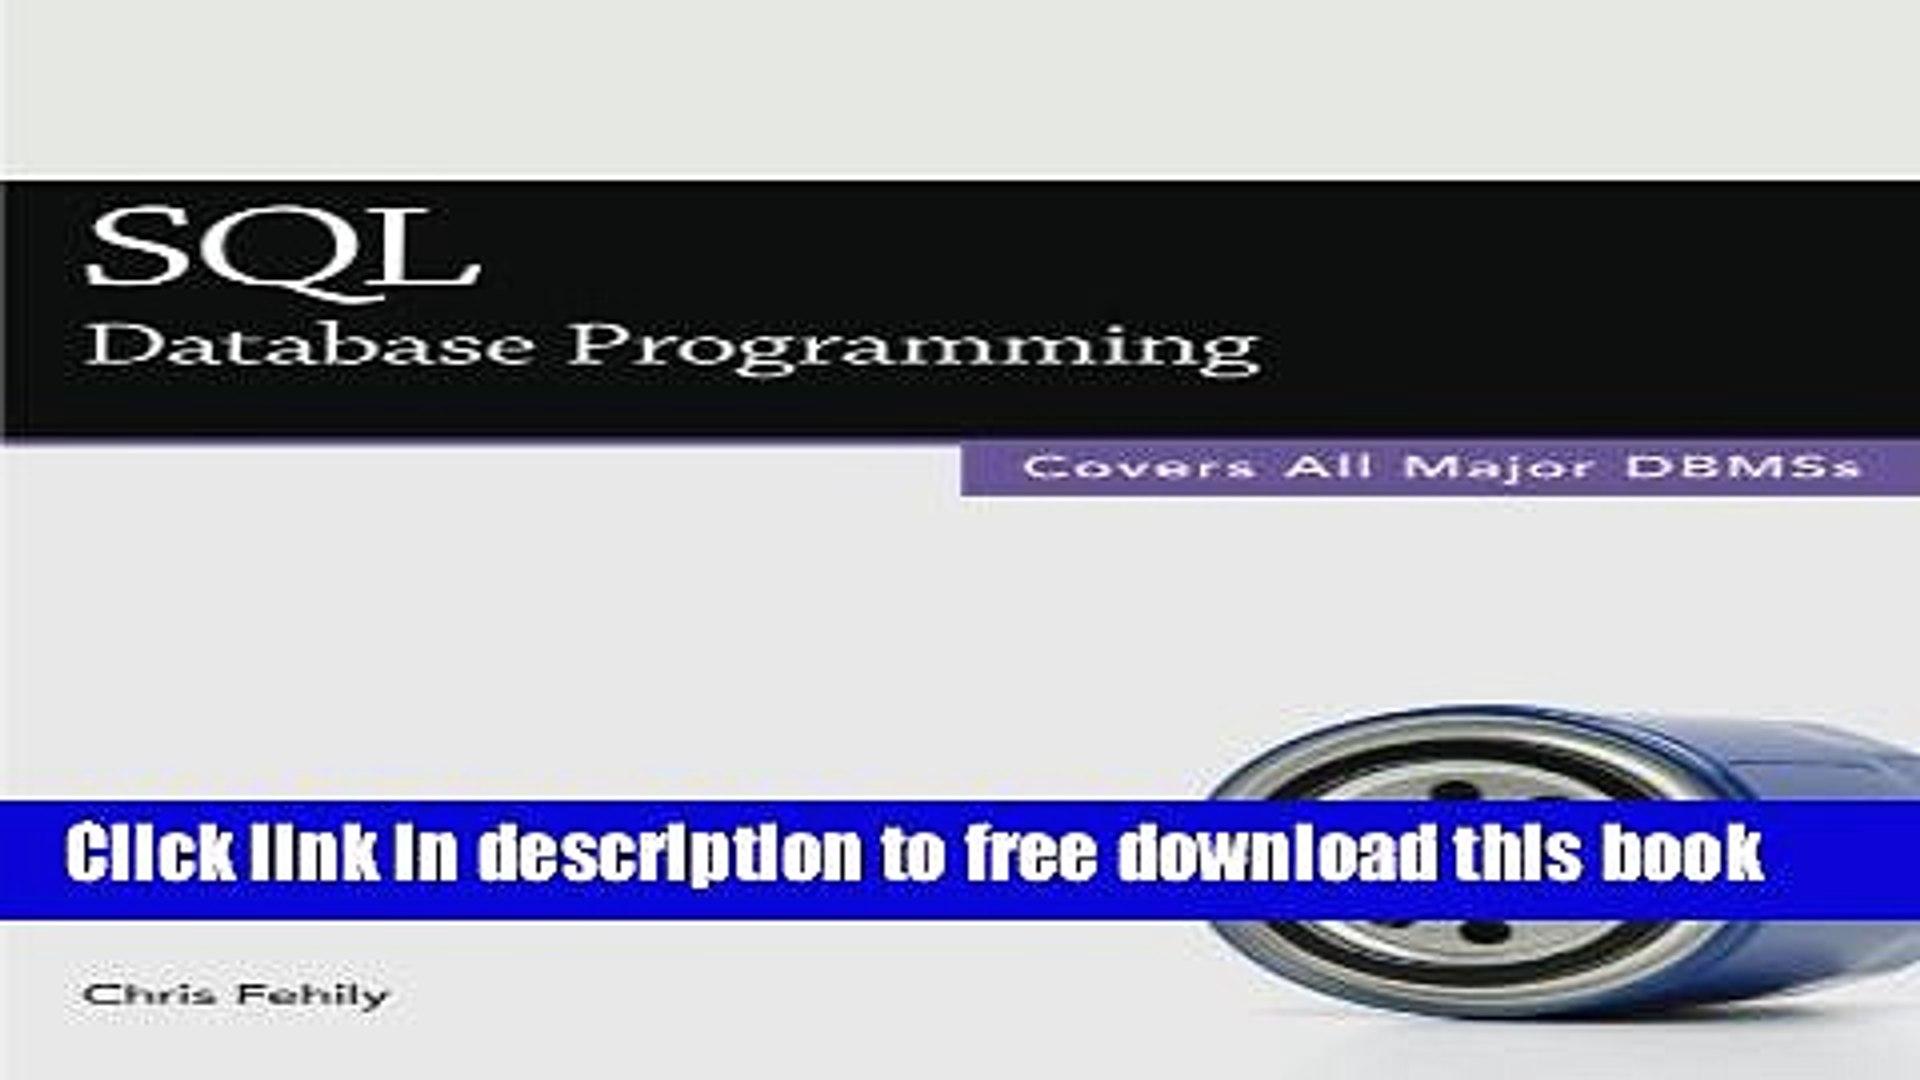 Download SQL (Database Programming) Book Free